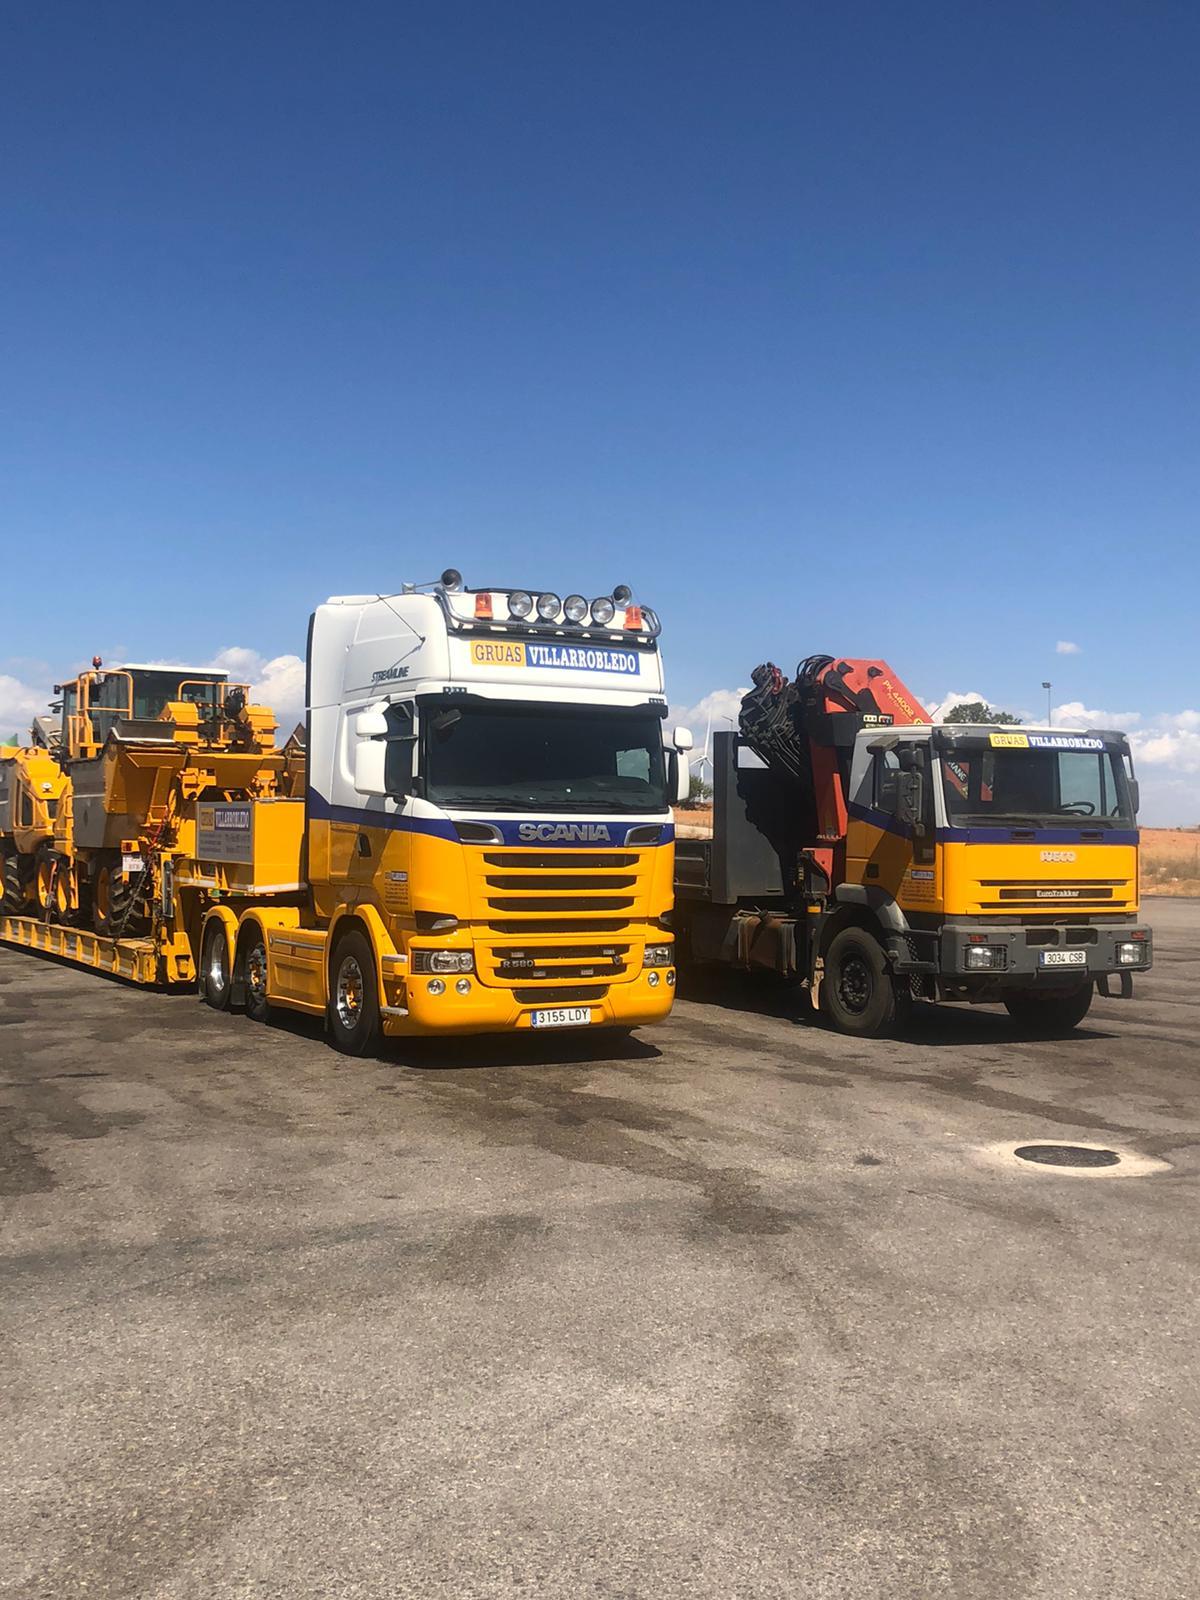 Dos-camiones-carretera-vertical